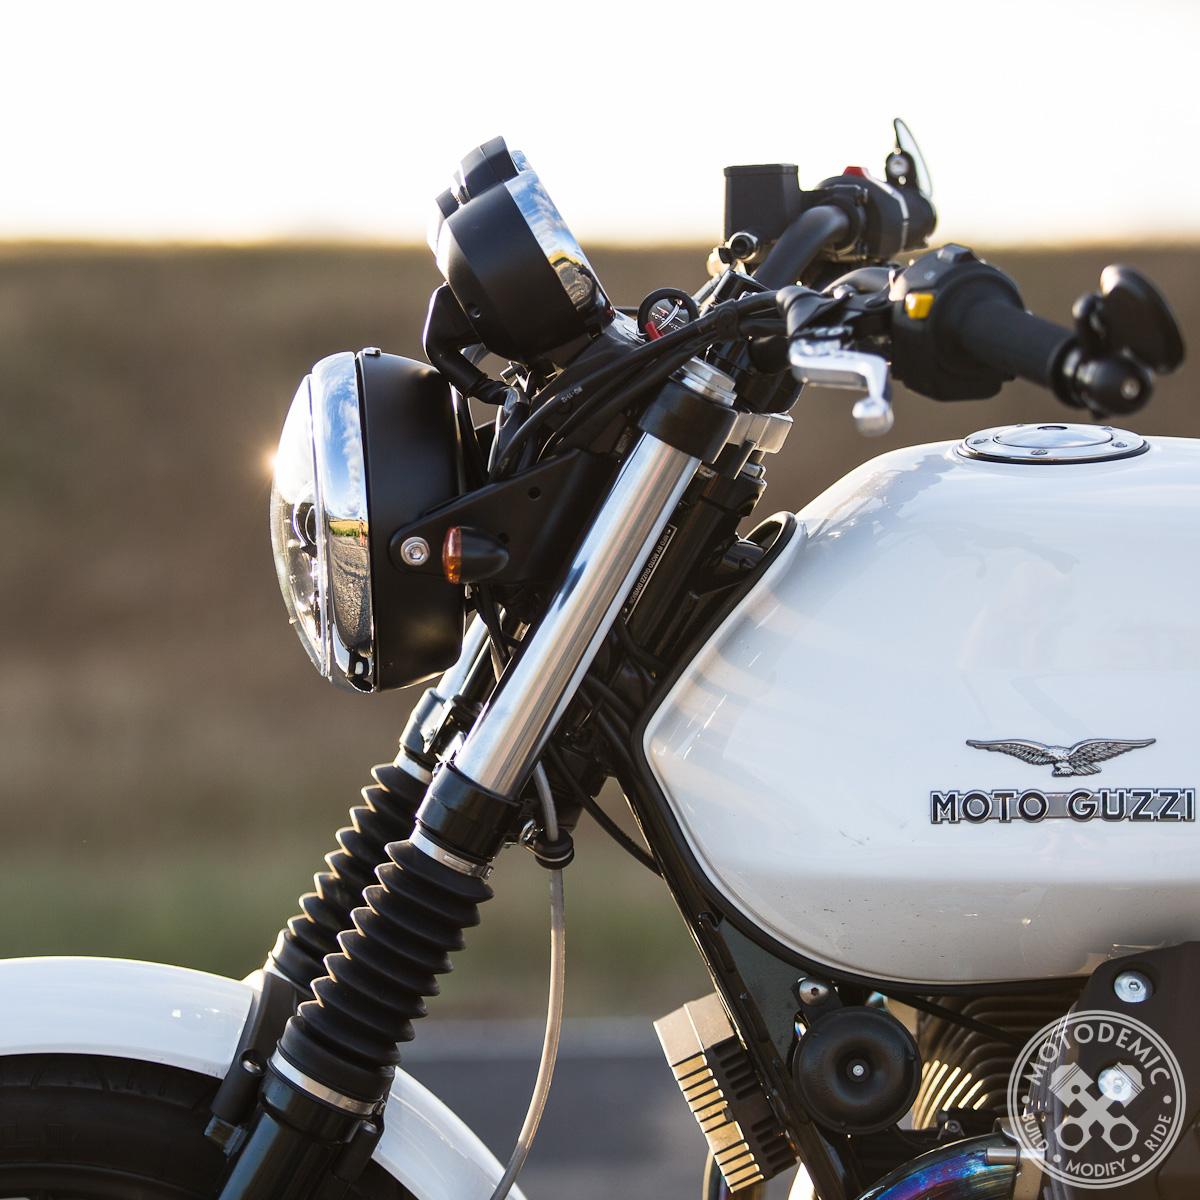 moto guzzi led headlight upgrade motodemic. Black Bedroom Furniture Sets. Home Design Ideas